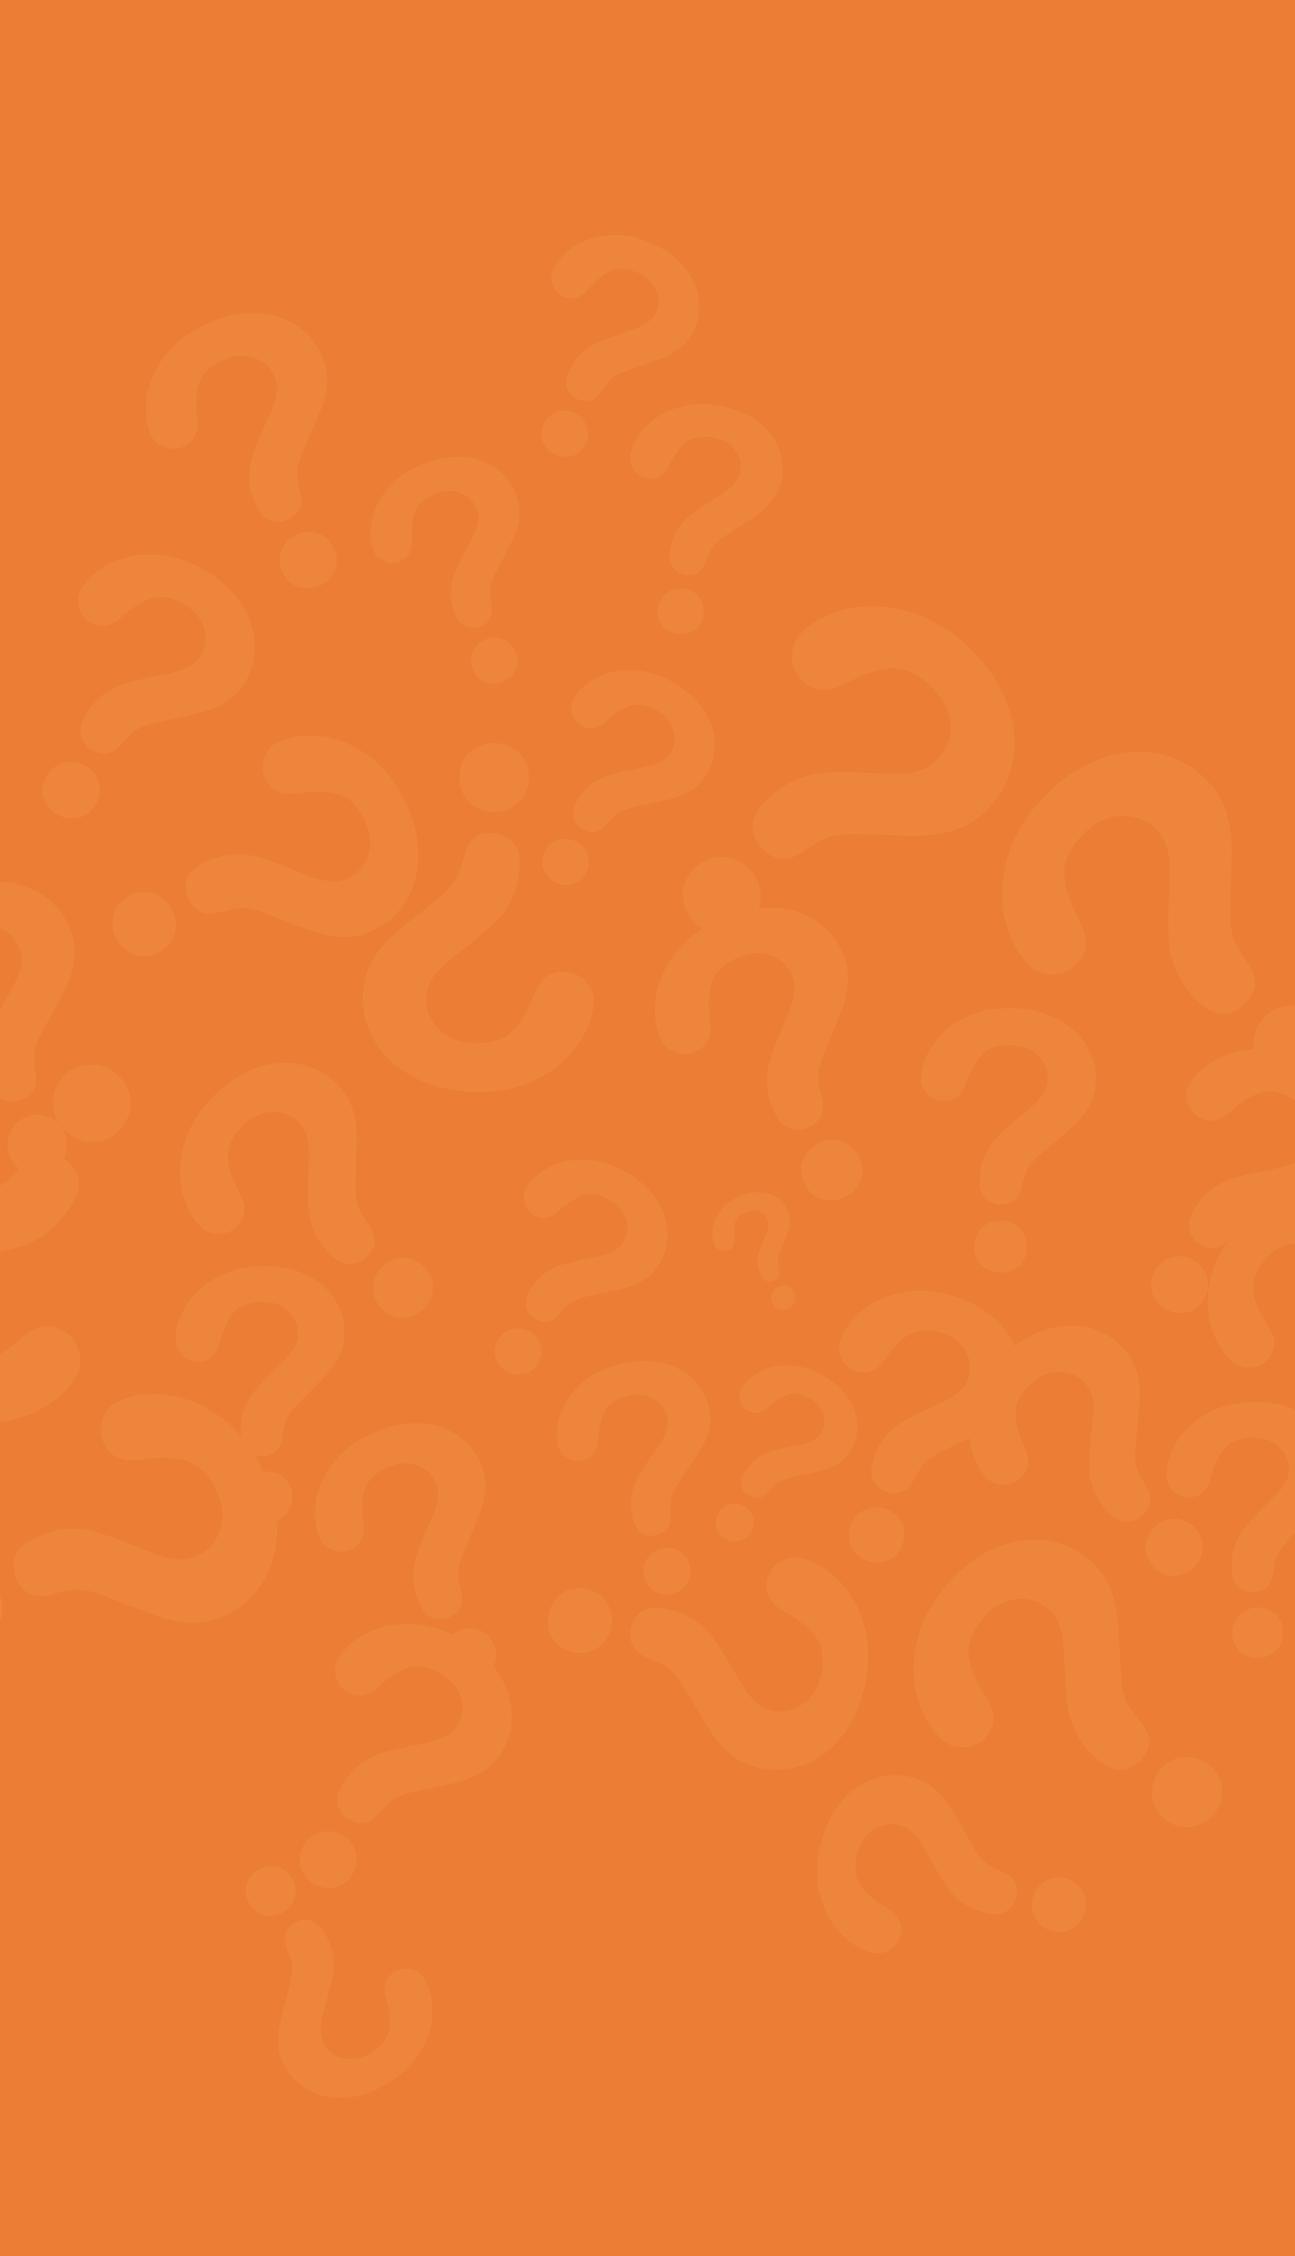 question-bg.png